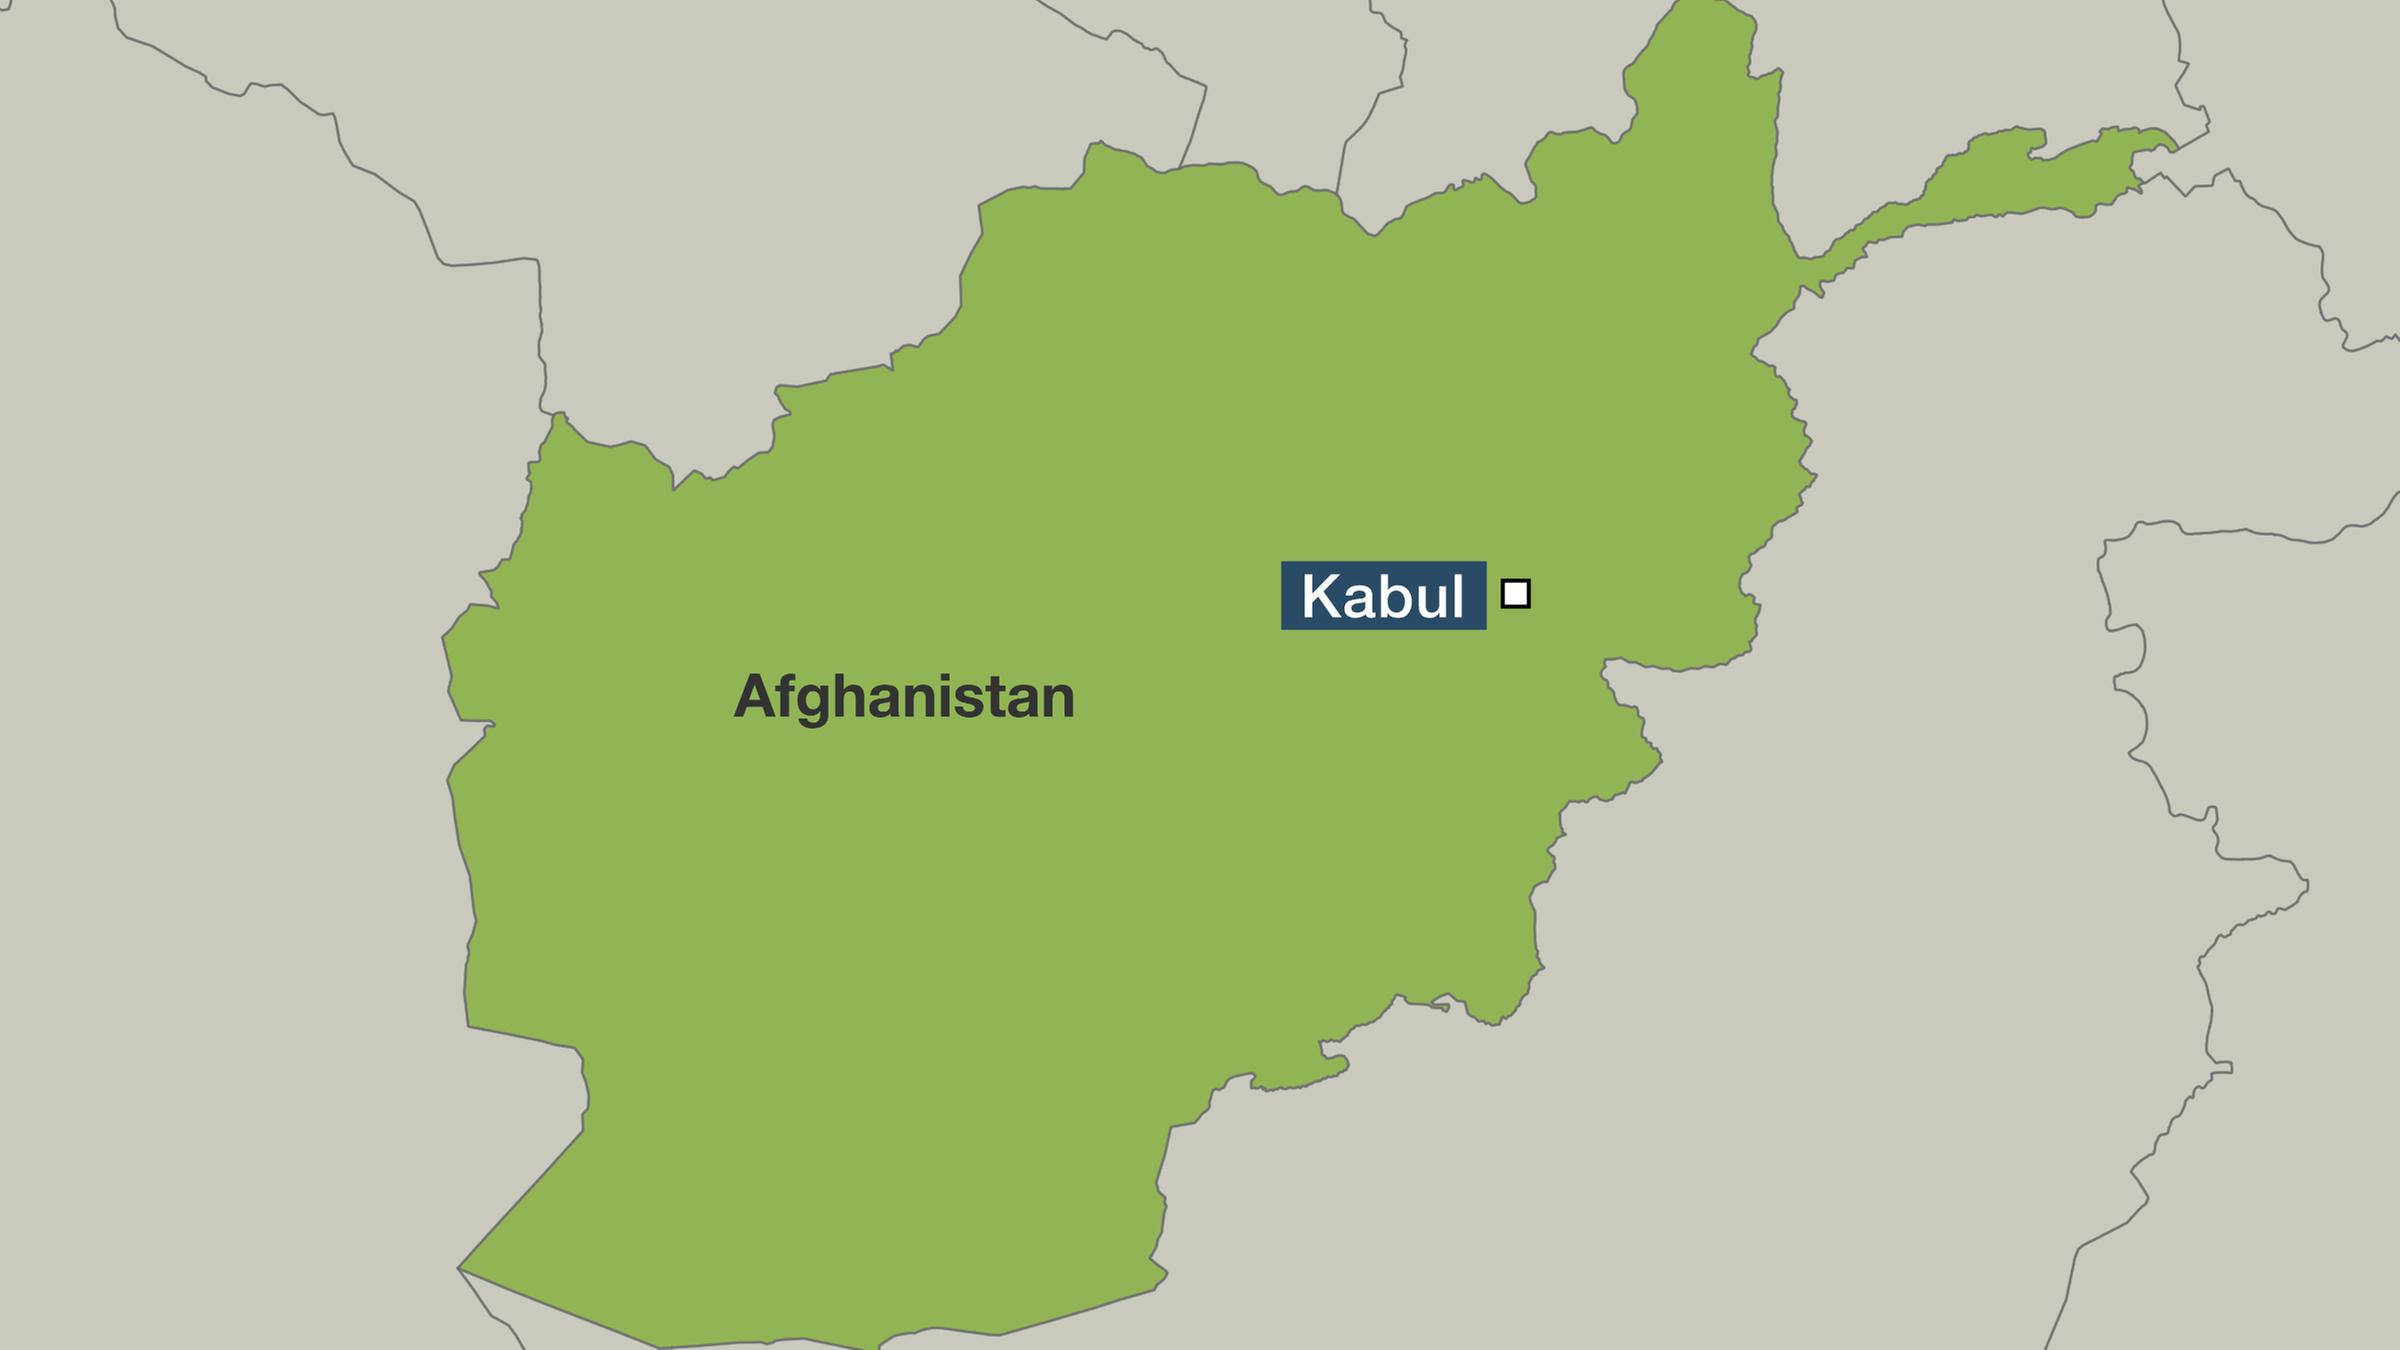 Karte Afghanistan Provinzen.Angriff Auf Schiiten Moschee Mindestens 25 Tote In